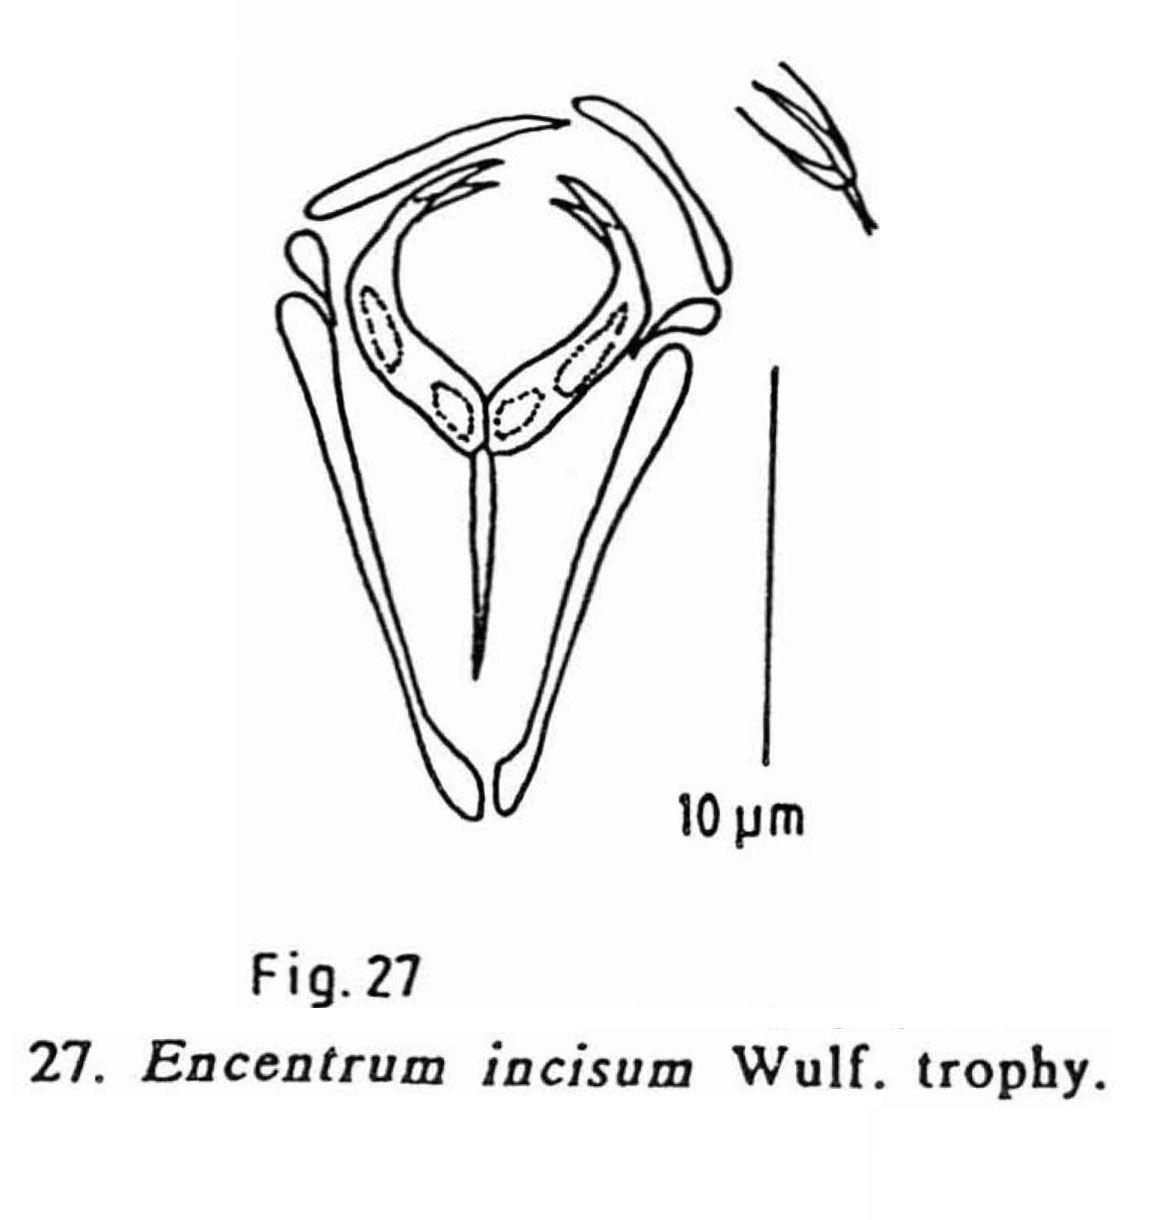 Encentrum incisum wulfert 1936